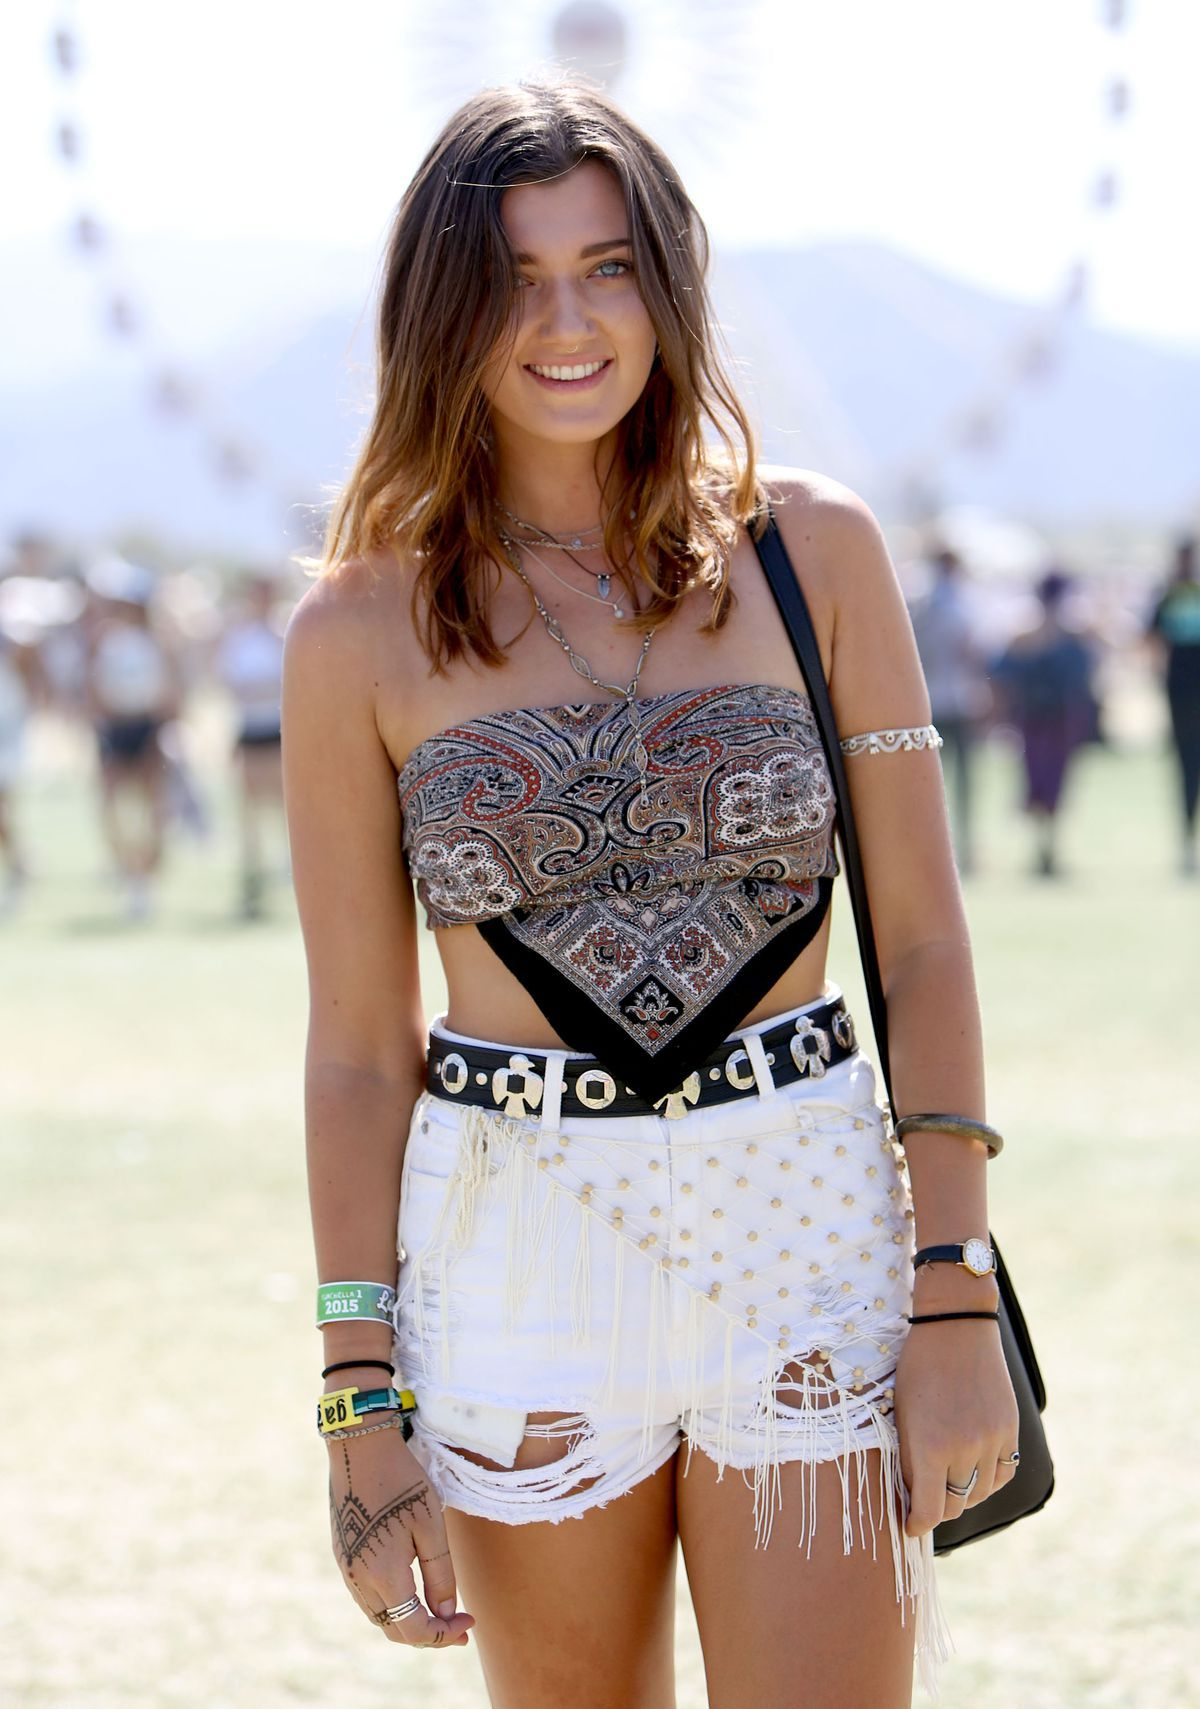 áo bandana at Coachella